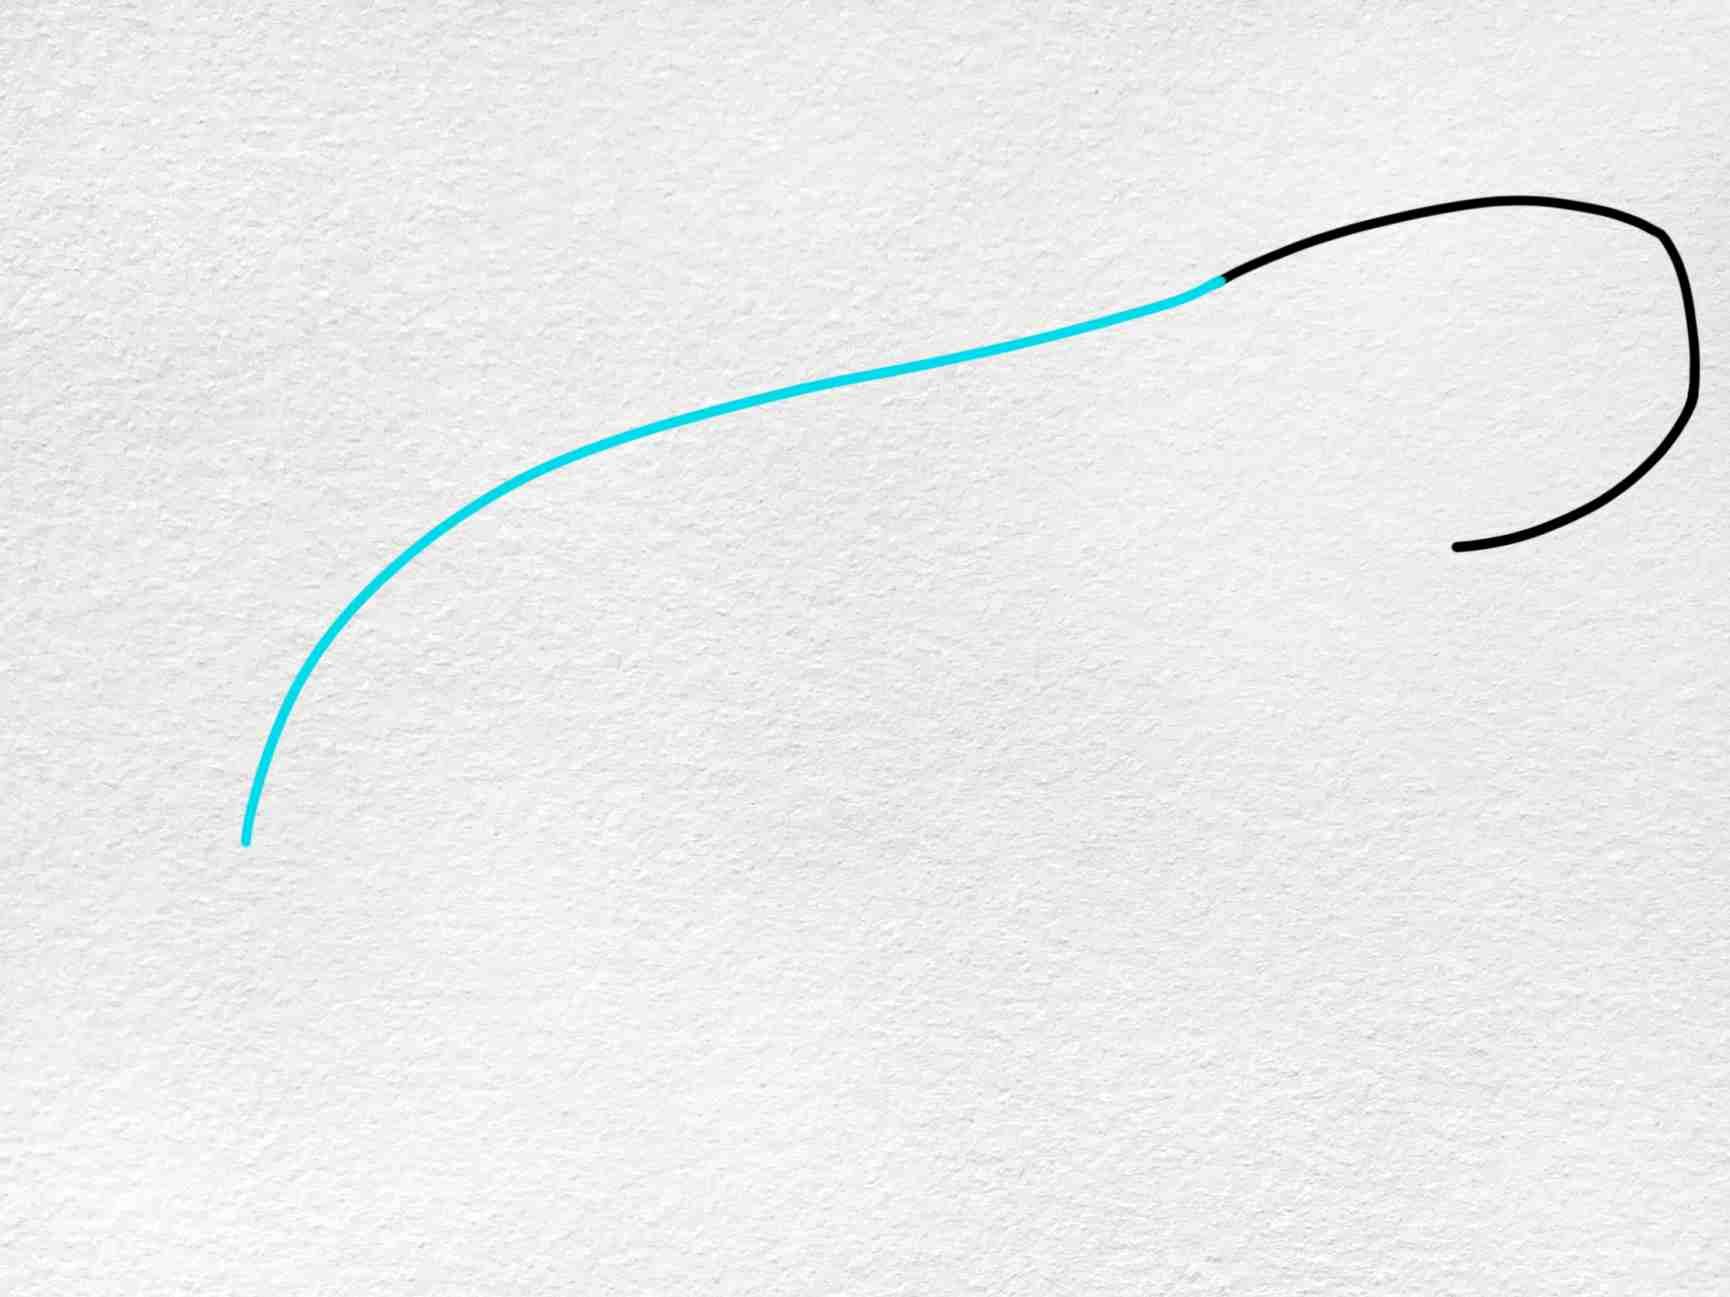 Manatee Drawing: Step 2